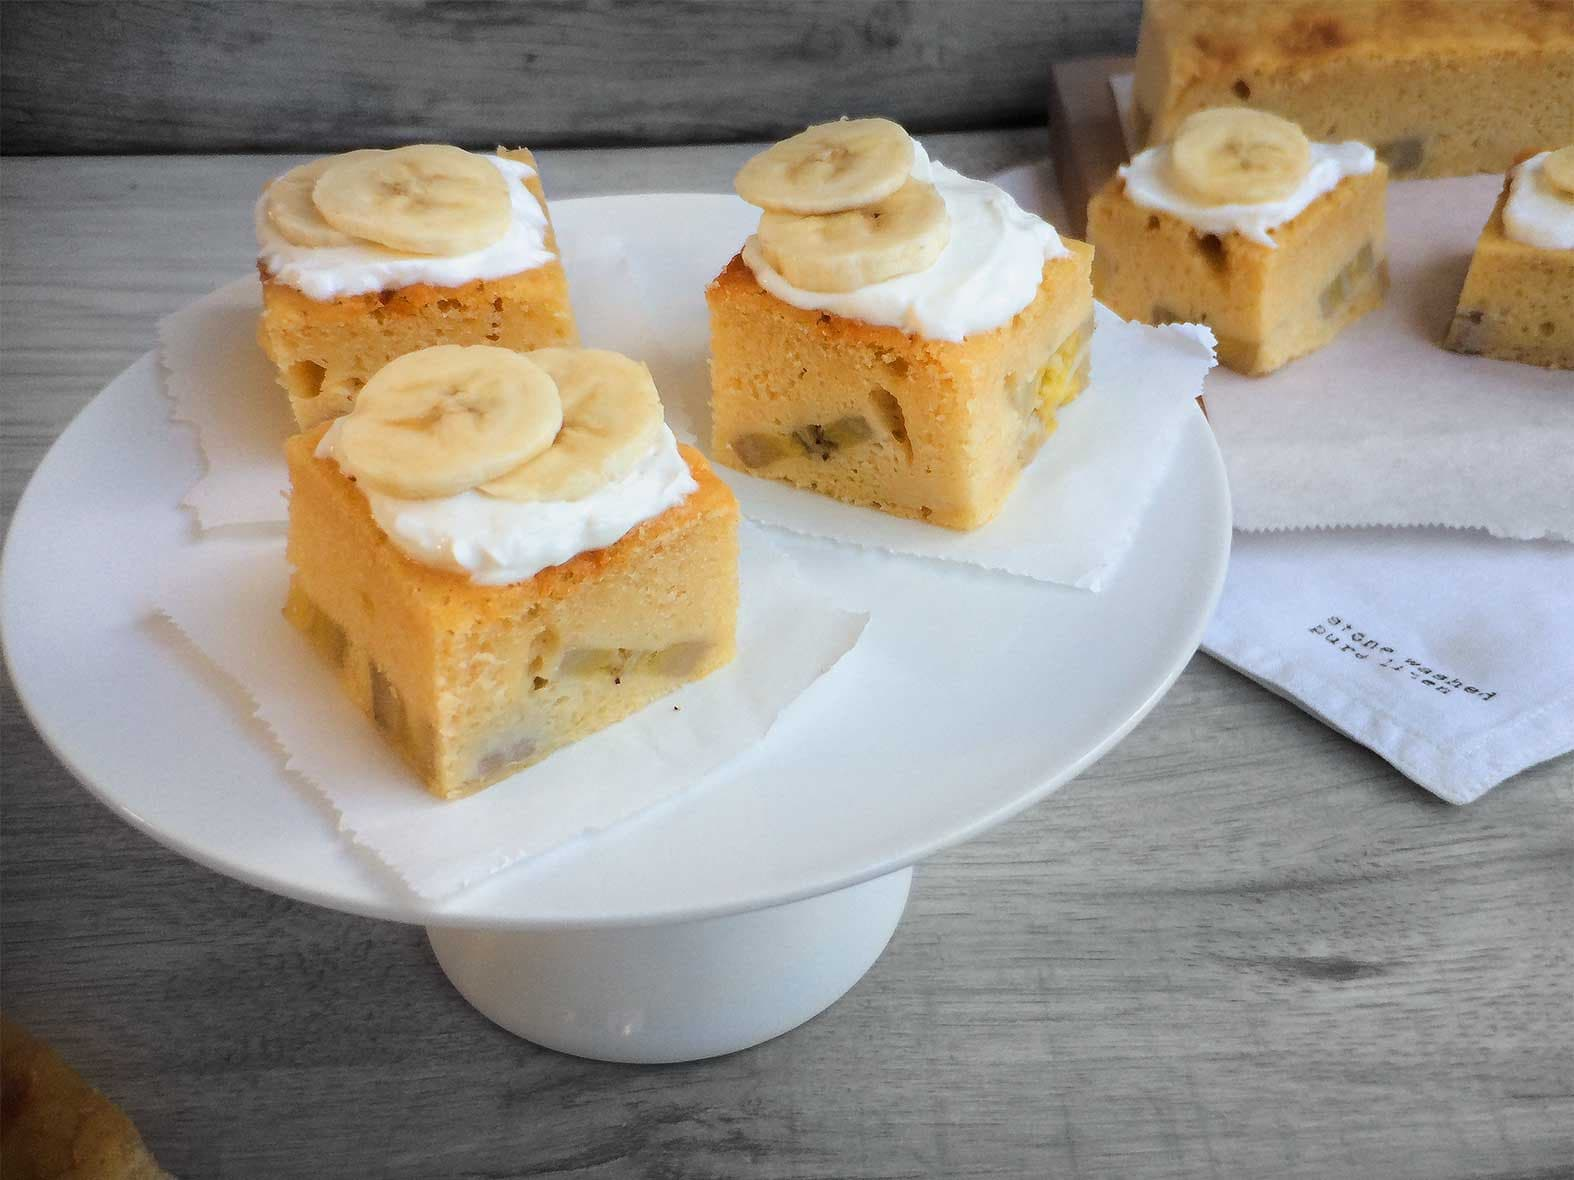 Bananenbrood 'blondies'